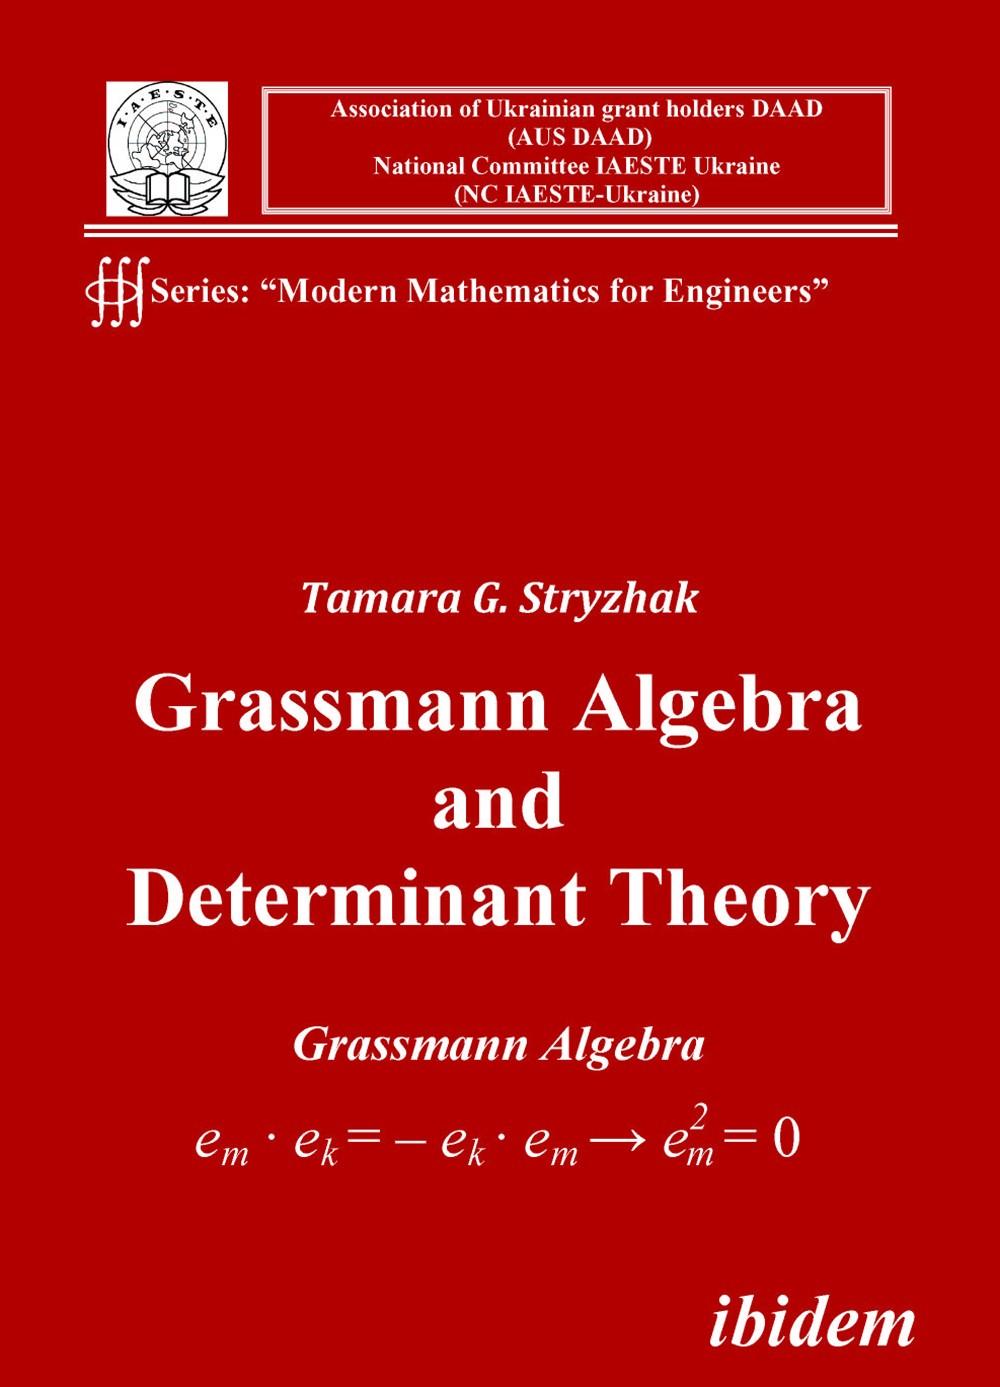 Grassmann Algebra and Determinant Theory